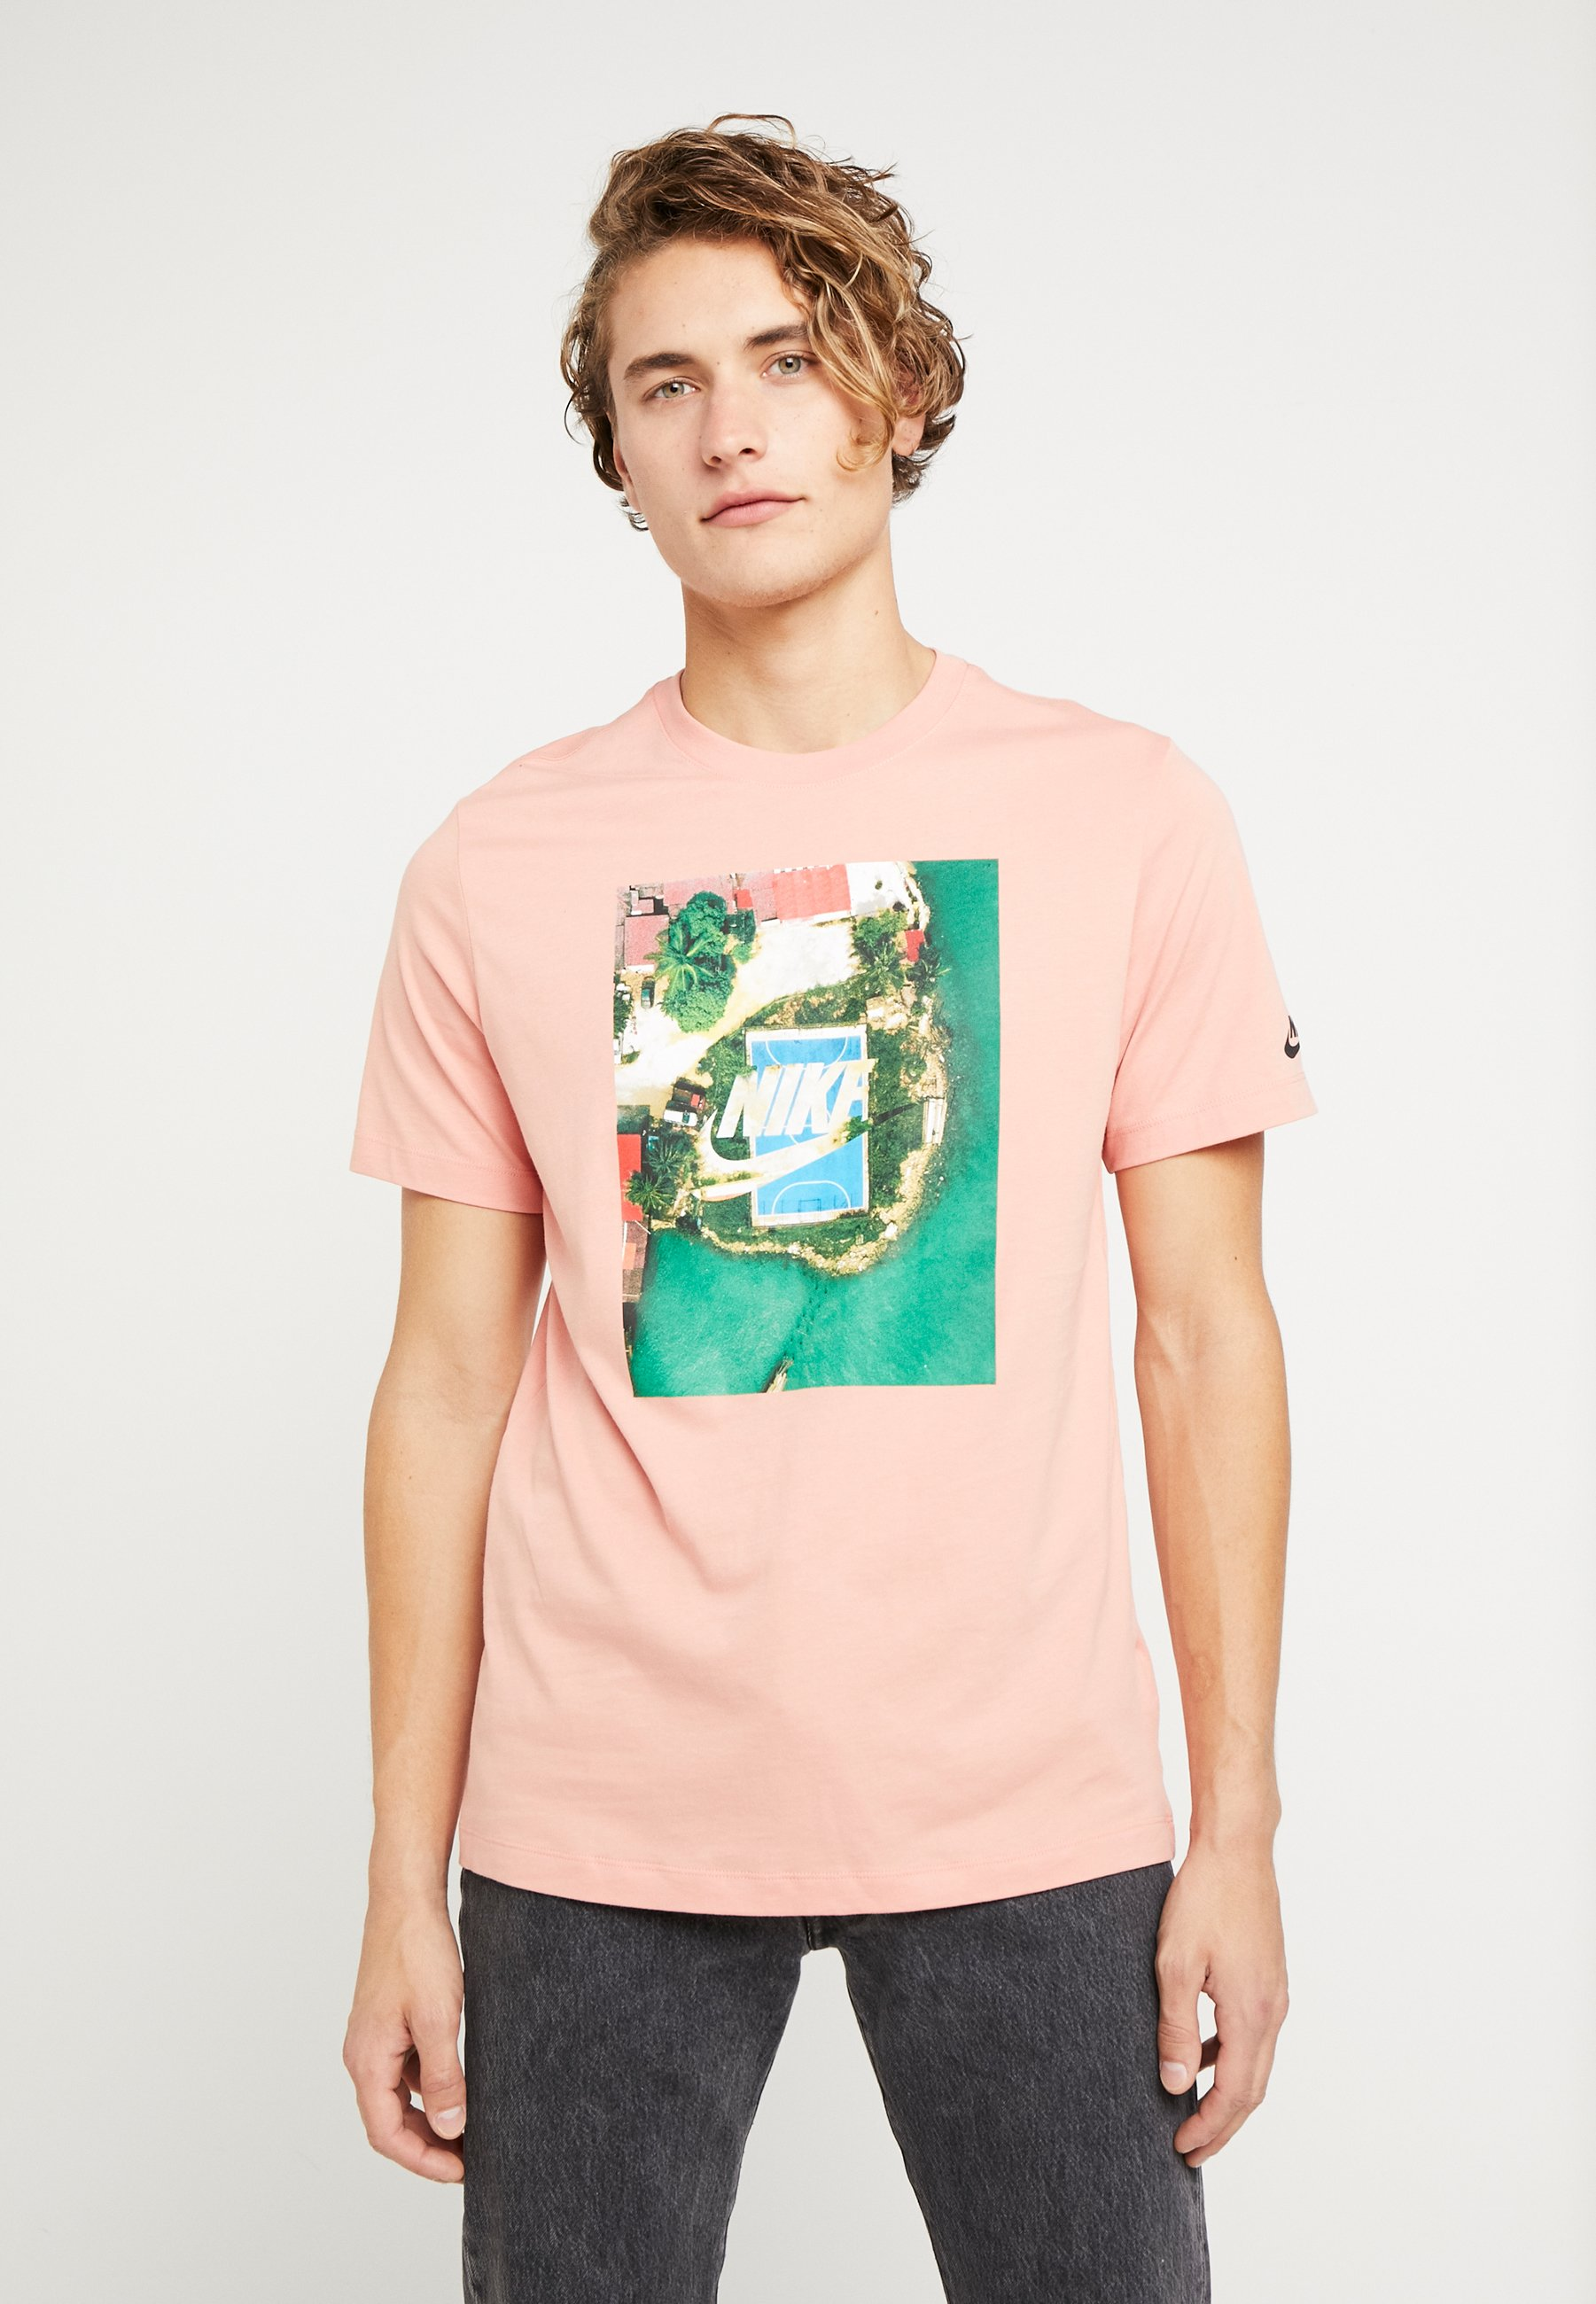 quartz TEE pink COURTT print Sportswear Shirt Nike DYWH2E9I